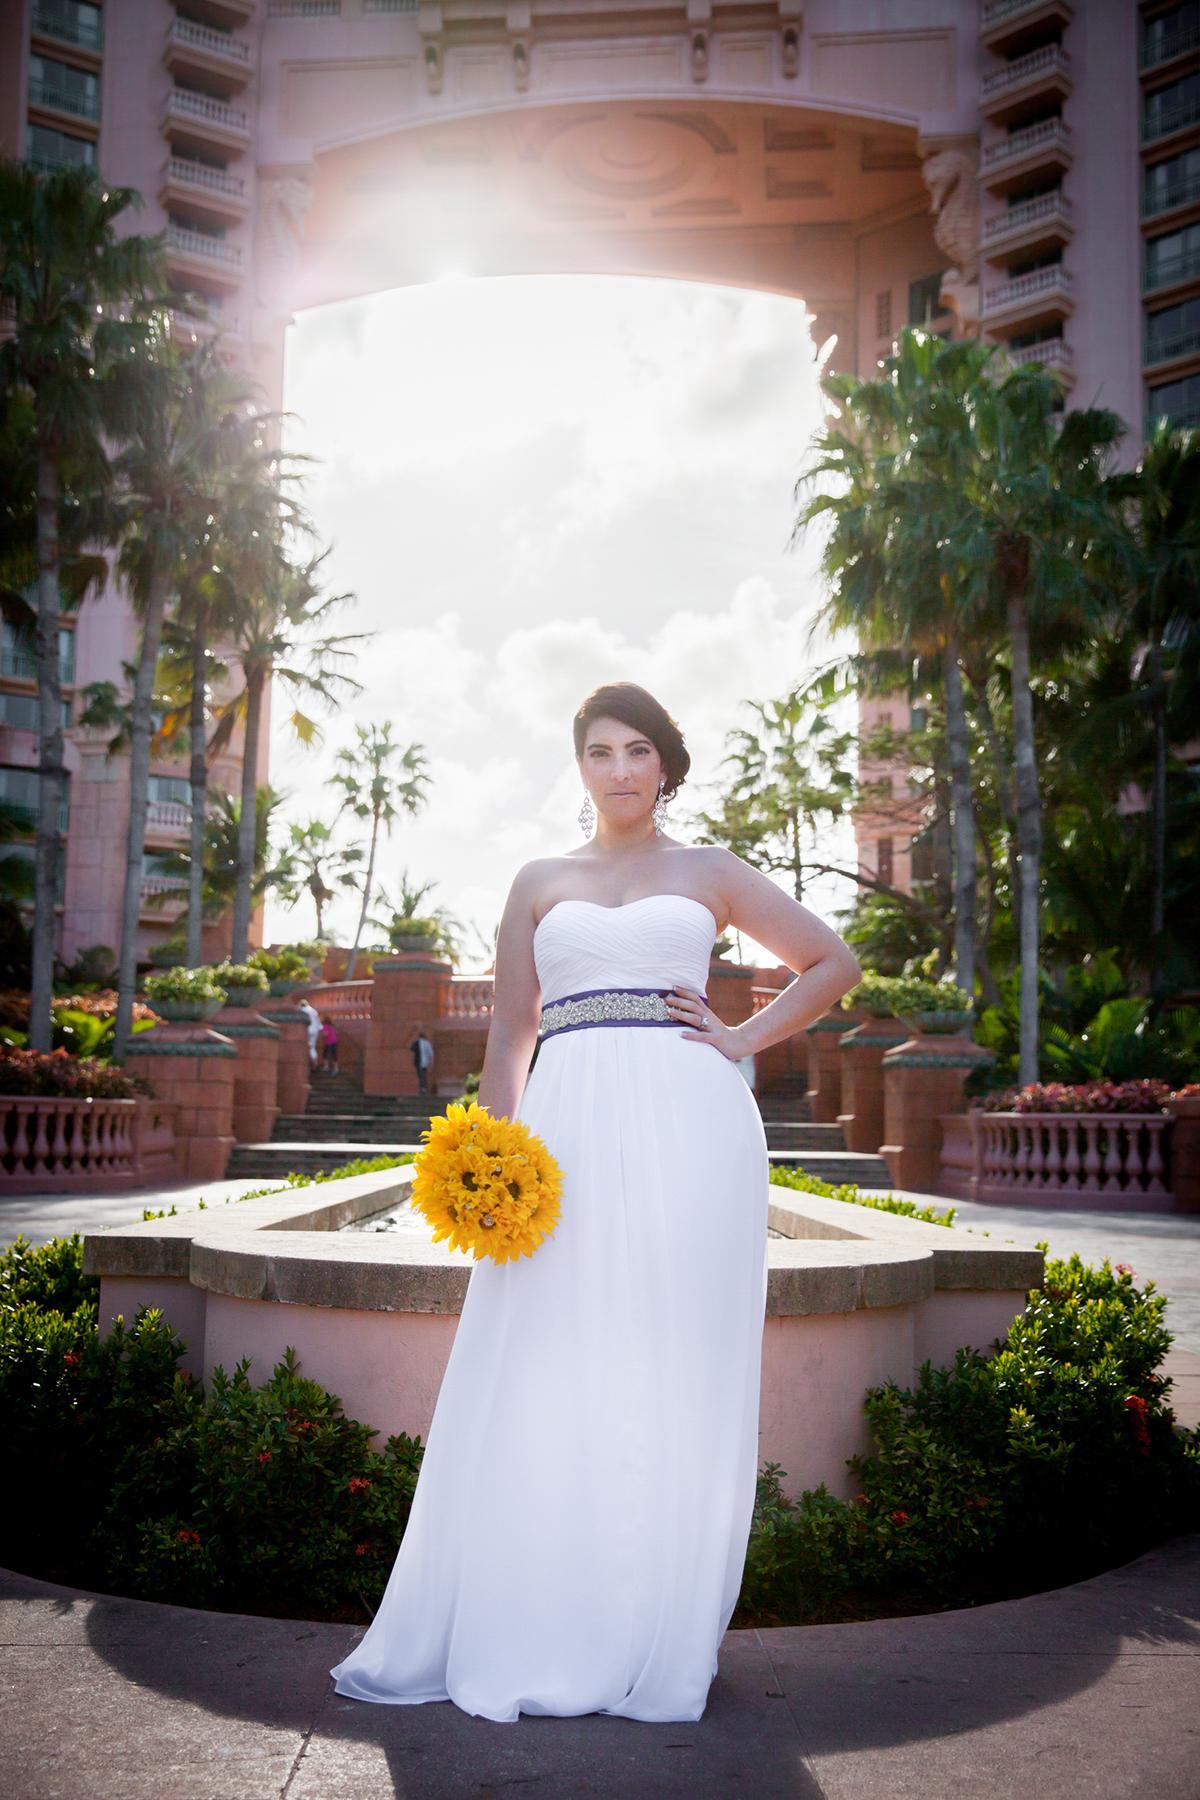 Daniela-Edvard_wedding_Dukat-Photos-1048.jpg